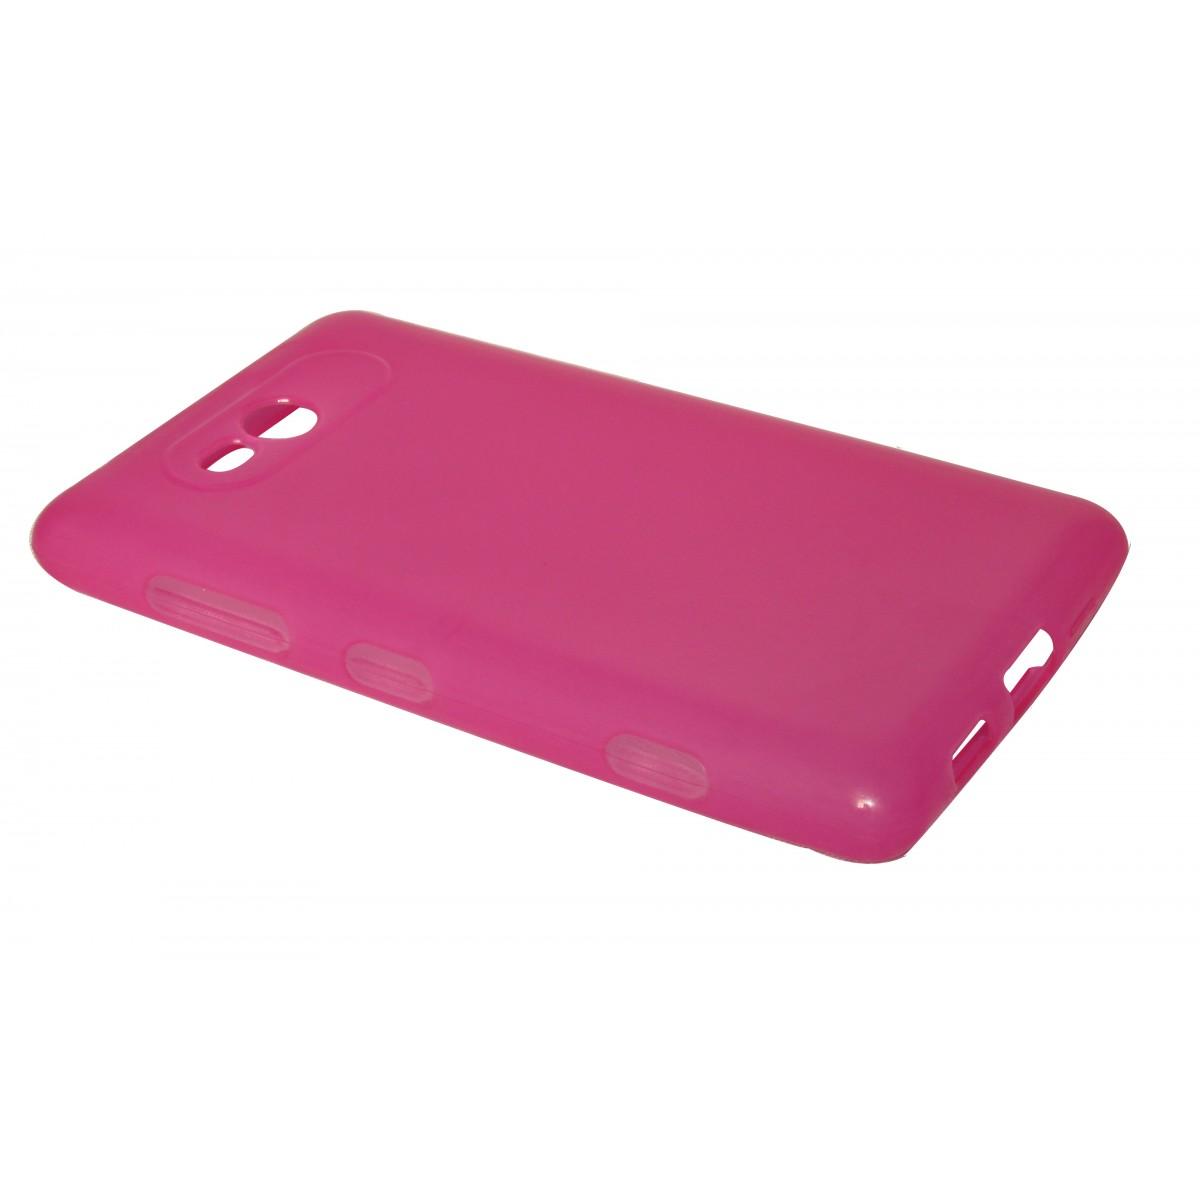 Capa TPU Rosa Nokia Lumia 820 N820 + Película Flexível